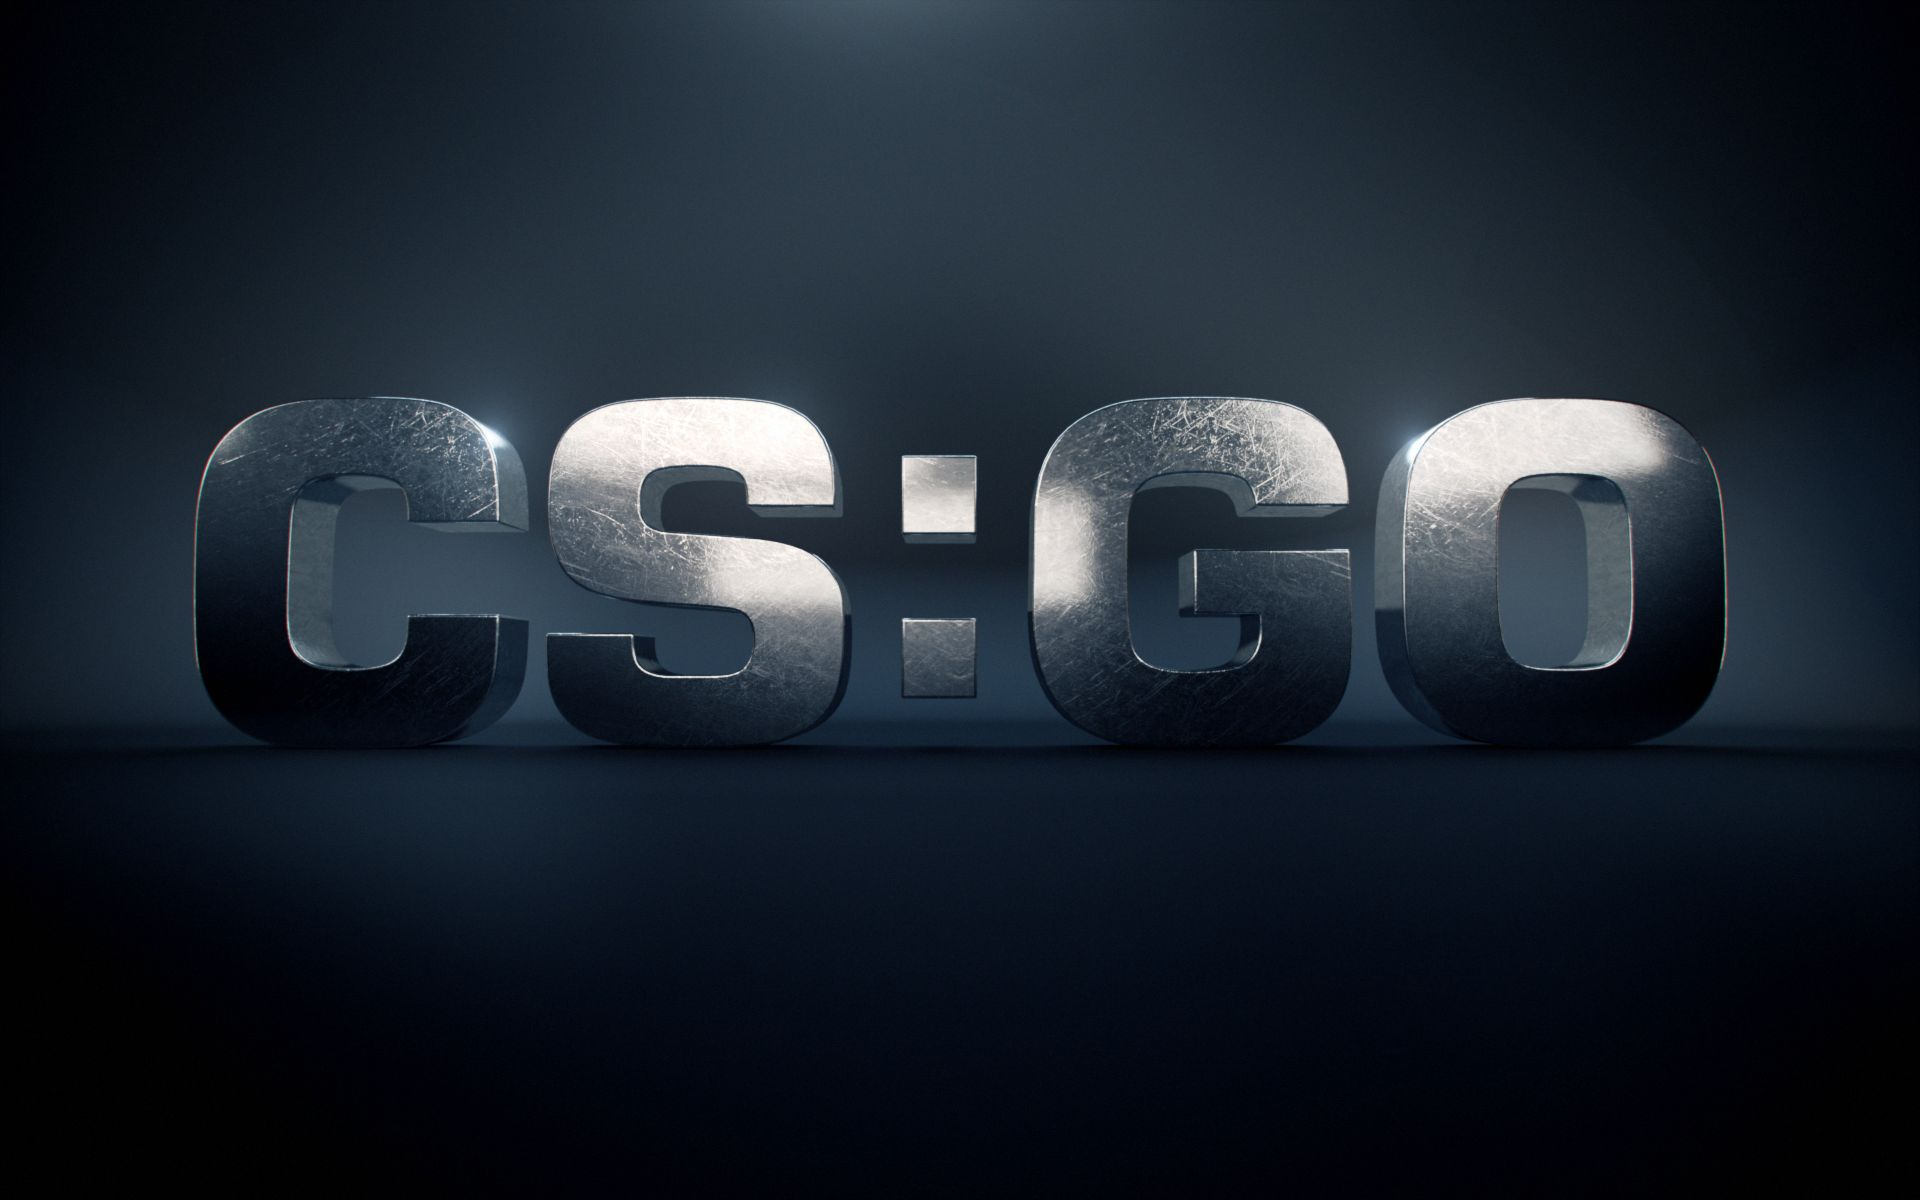 New csgo wallpapers imgurcom 1920x1200